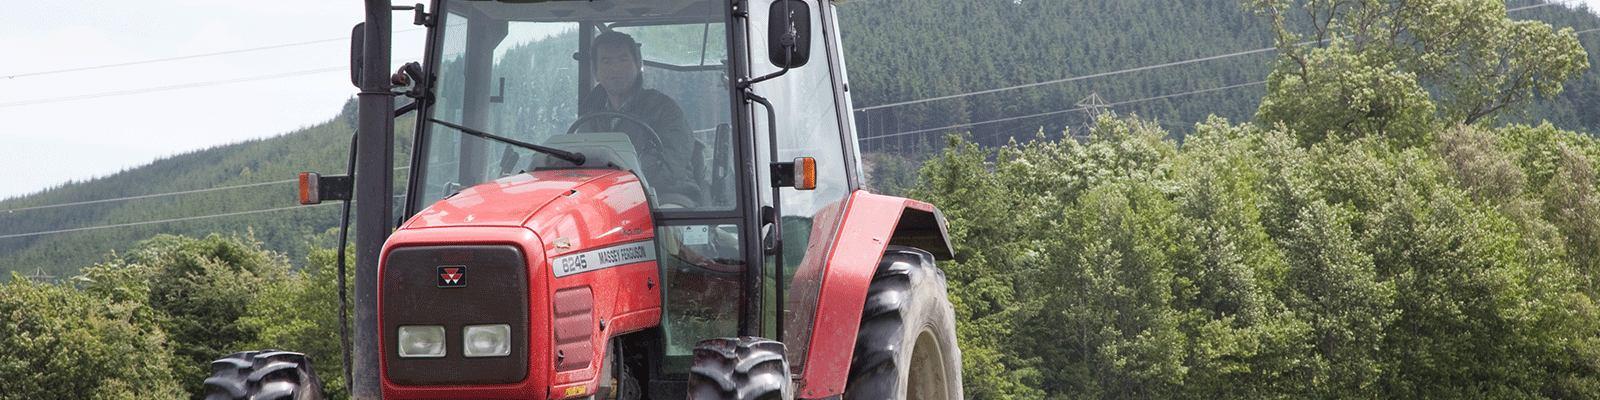 Farming Nature Asda